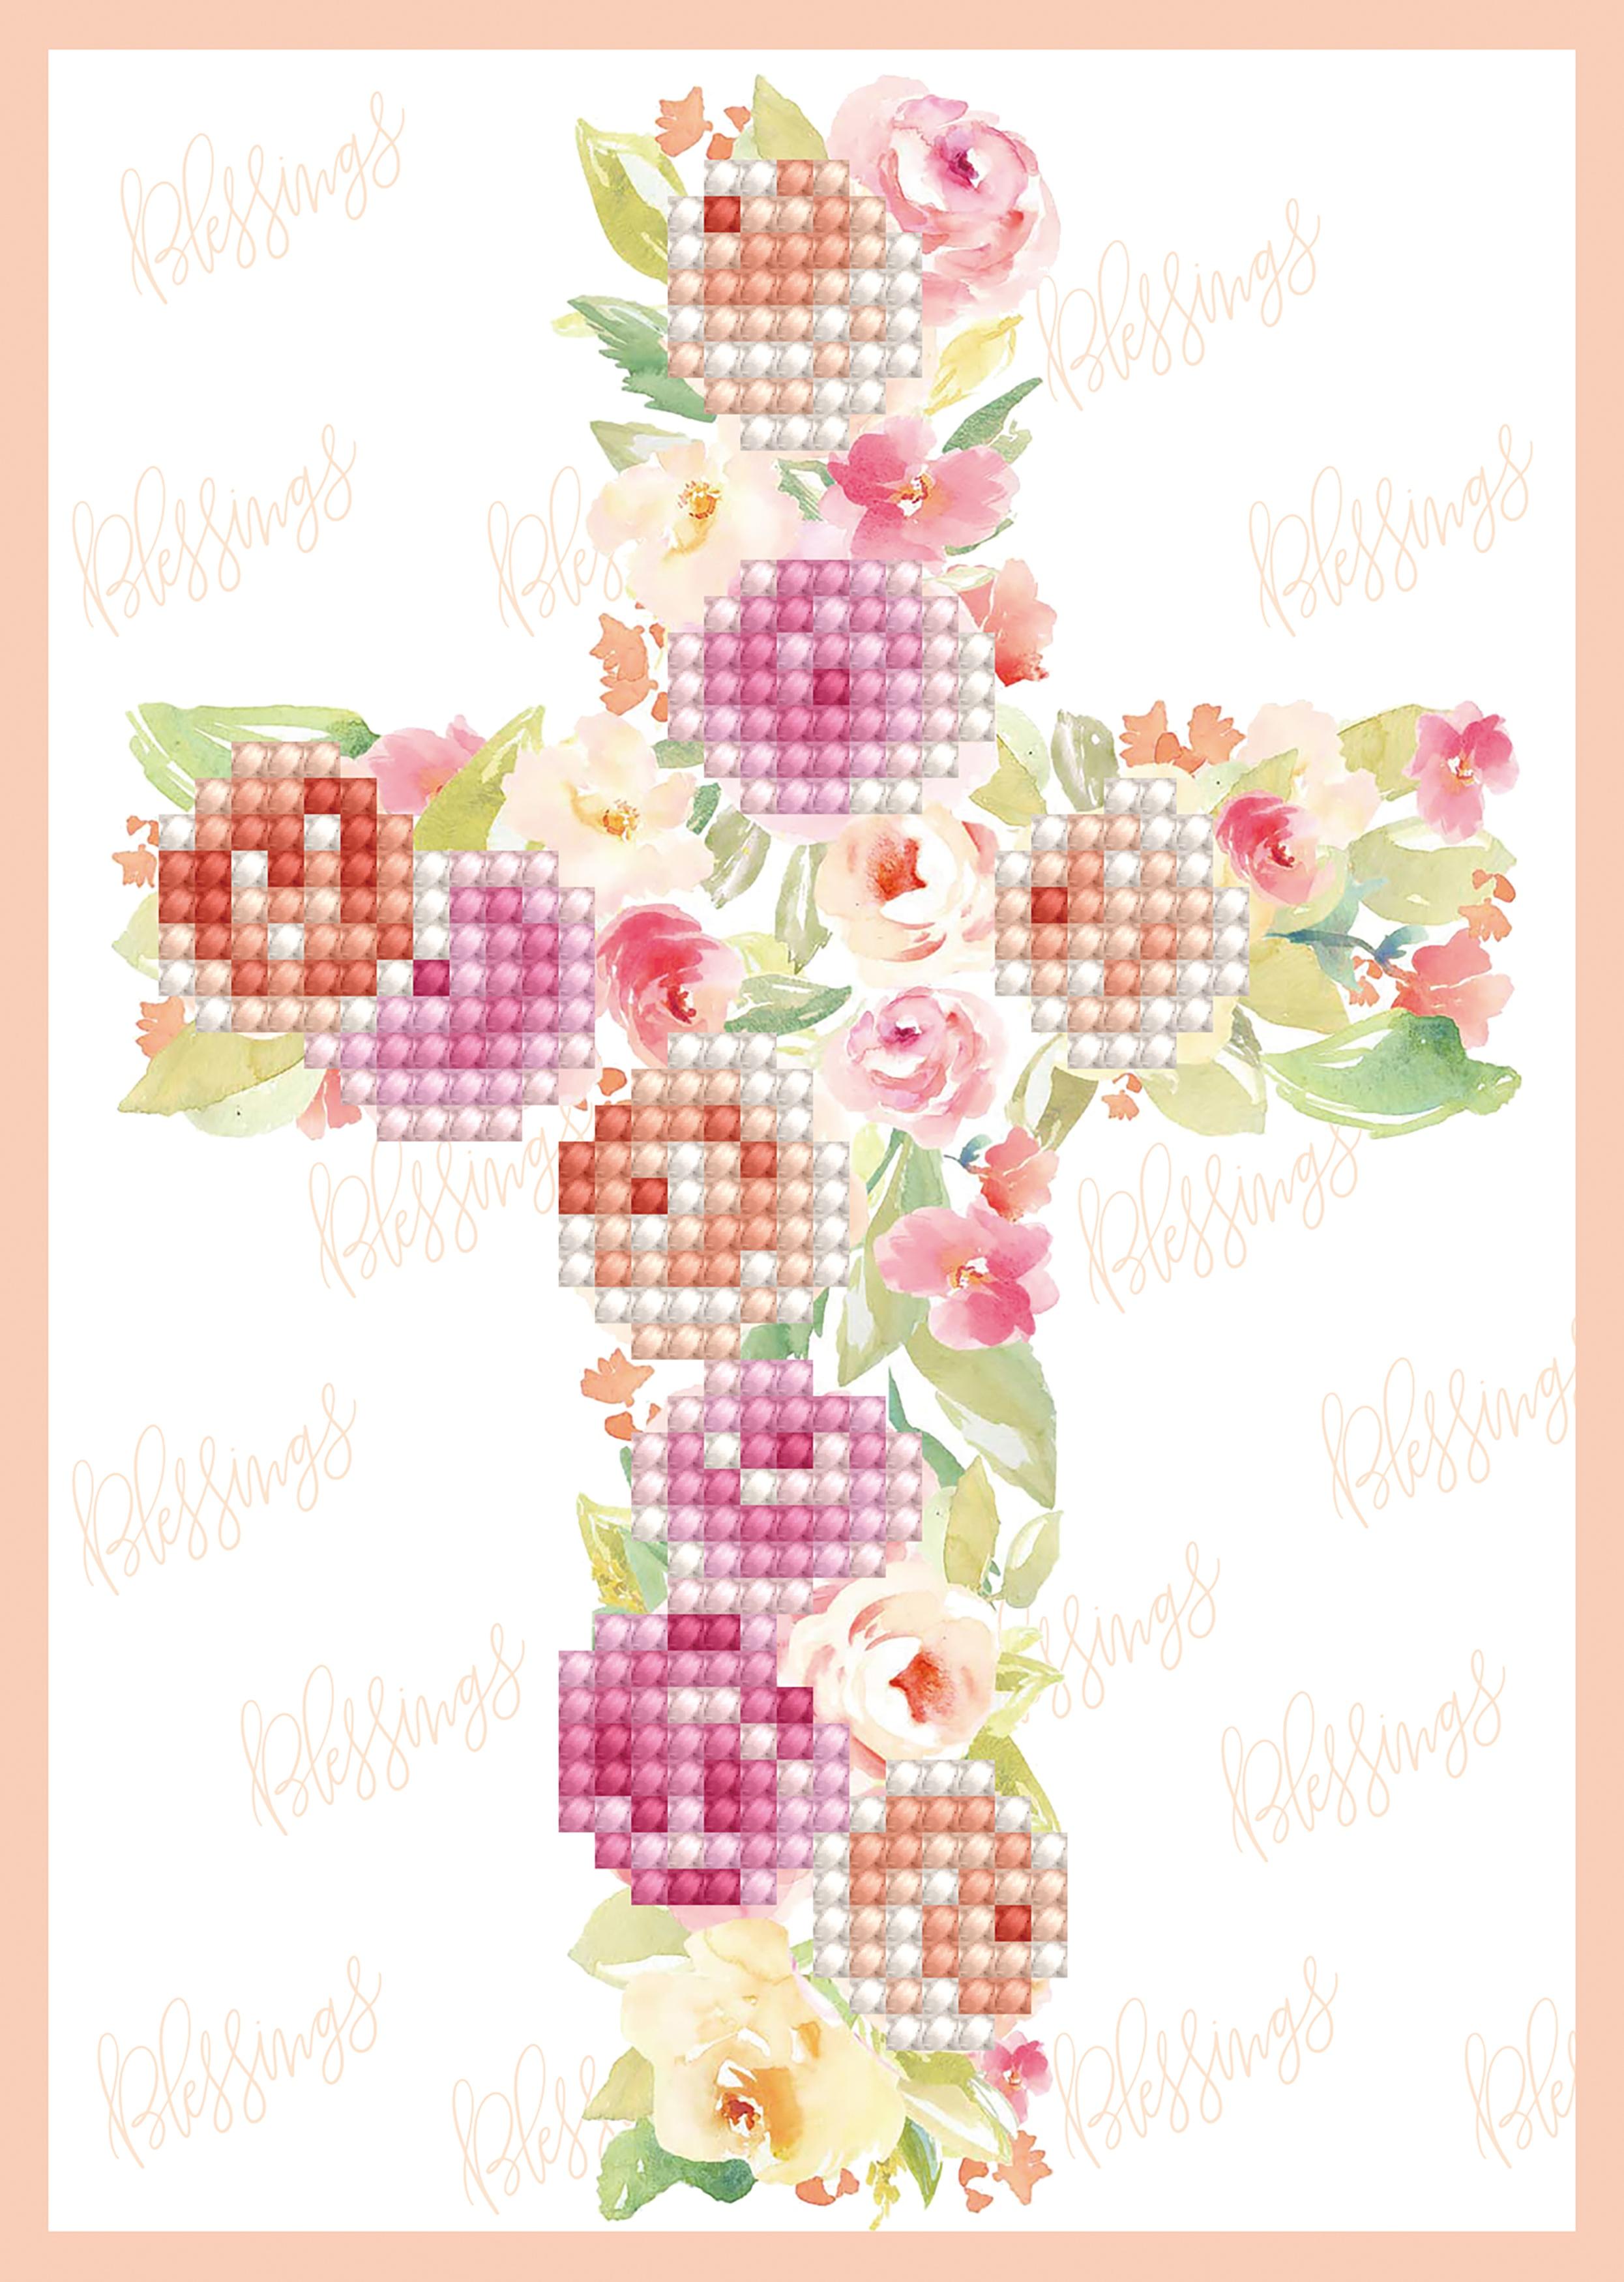 Diamond Dotz Diamond Embroidery Facet Art Greeting Card Kit - Blessings